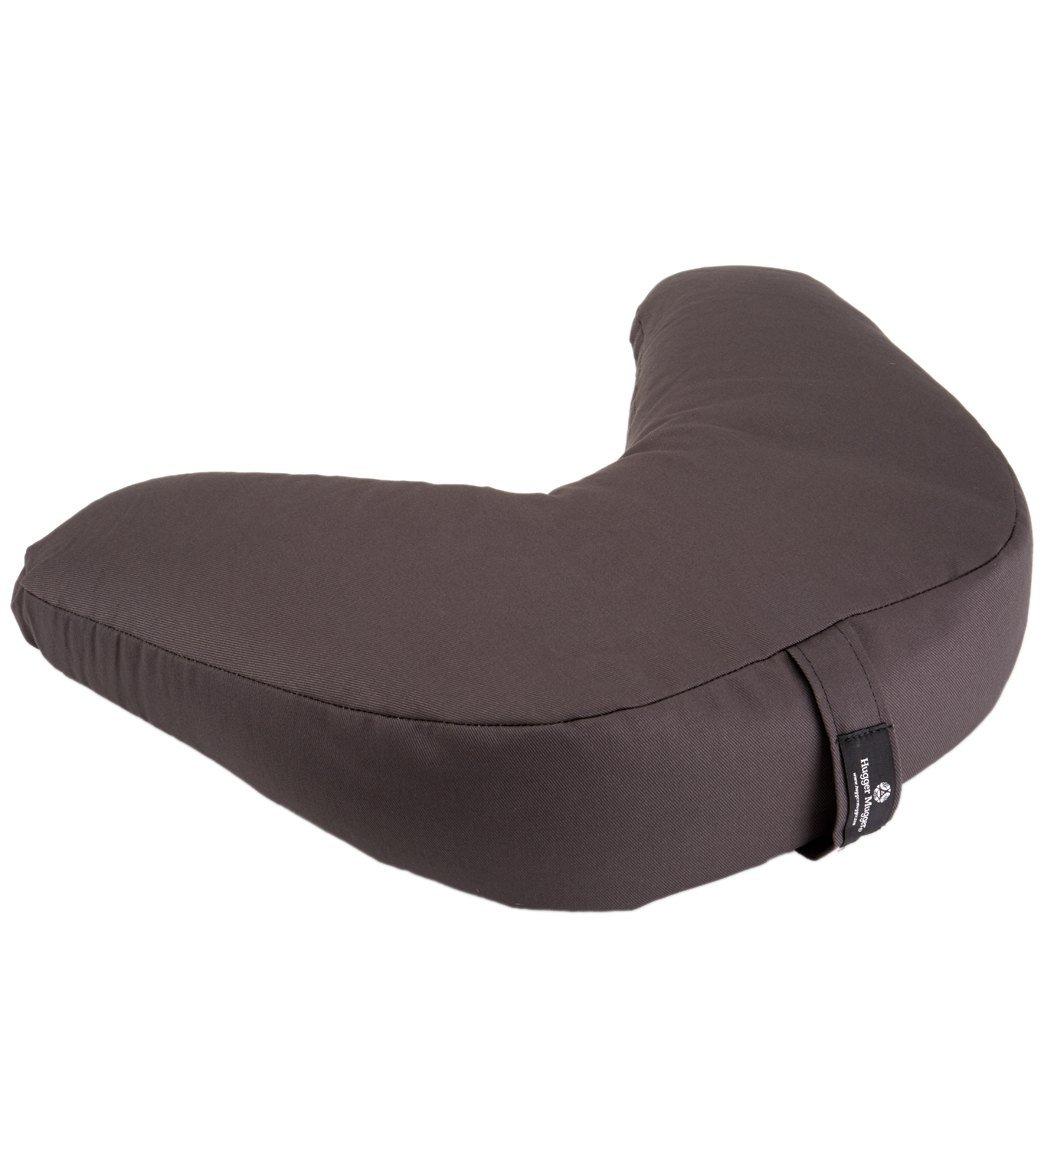 Hugger Mugger V-Shaped Yoga Cushion - Gray